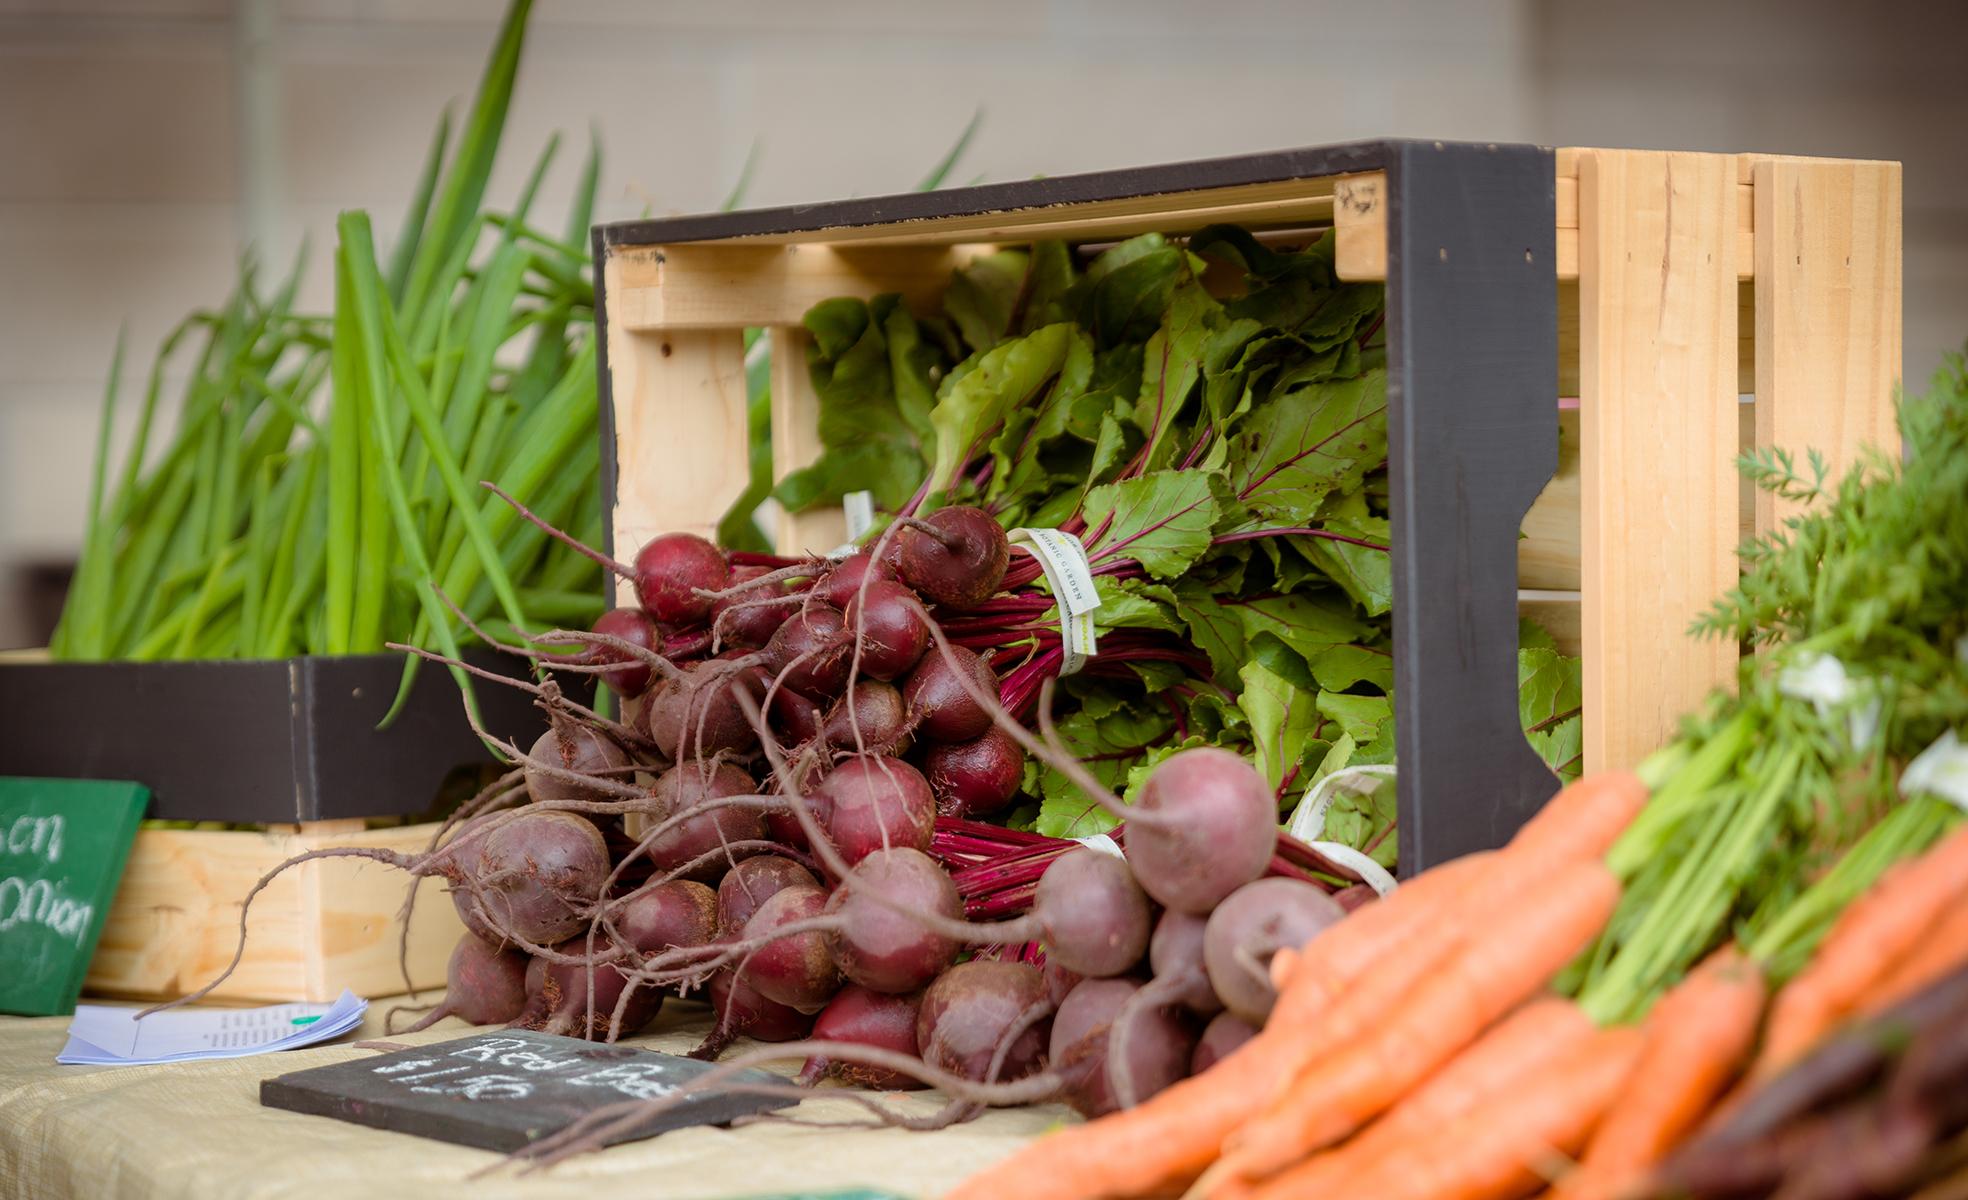 farmers_market_carrots_radishes.jpg